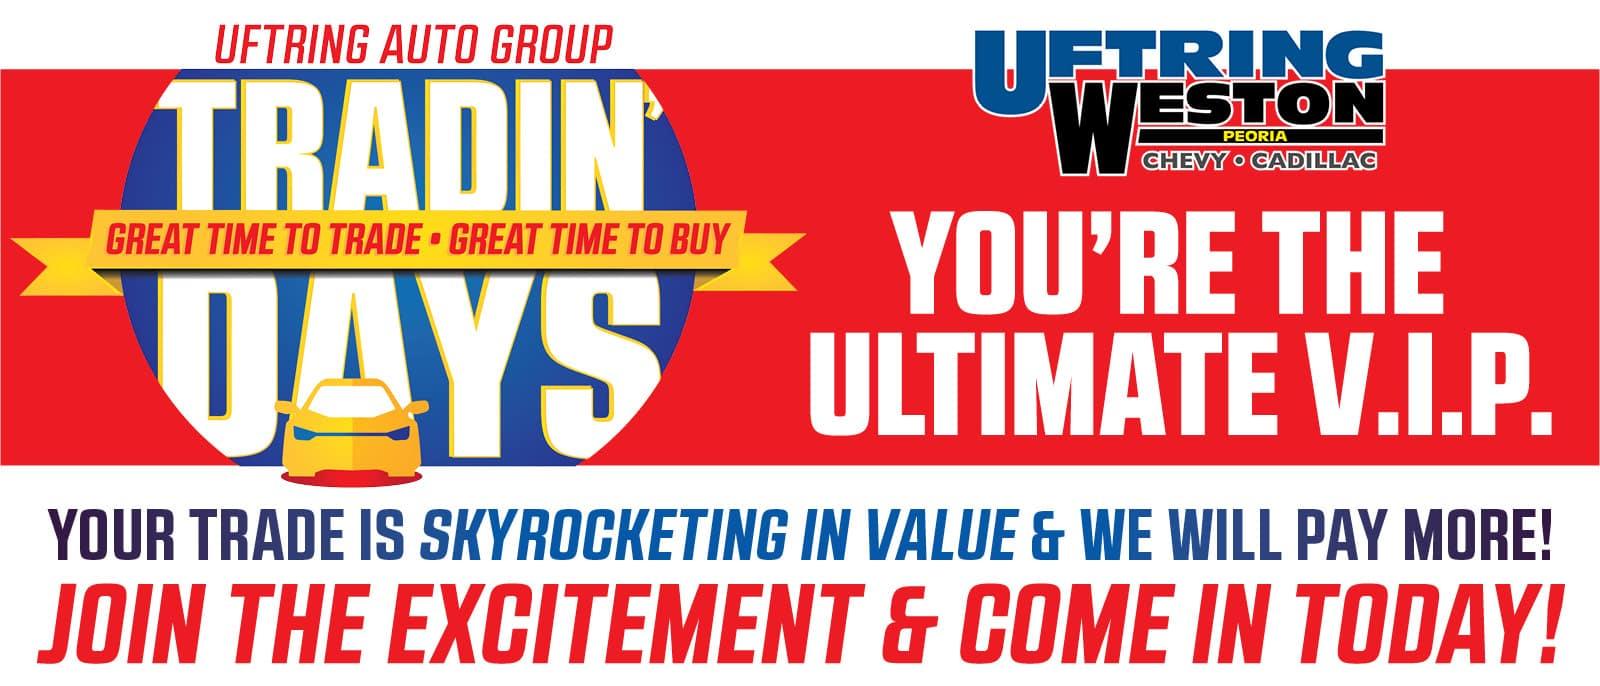 UWC Web Banner Tradin Days 6.4.21